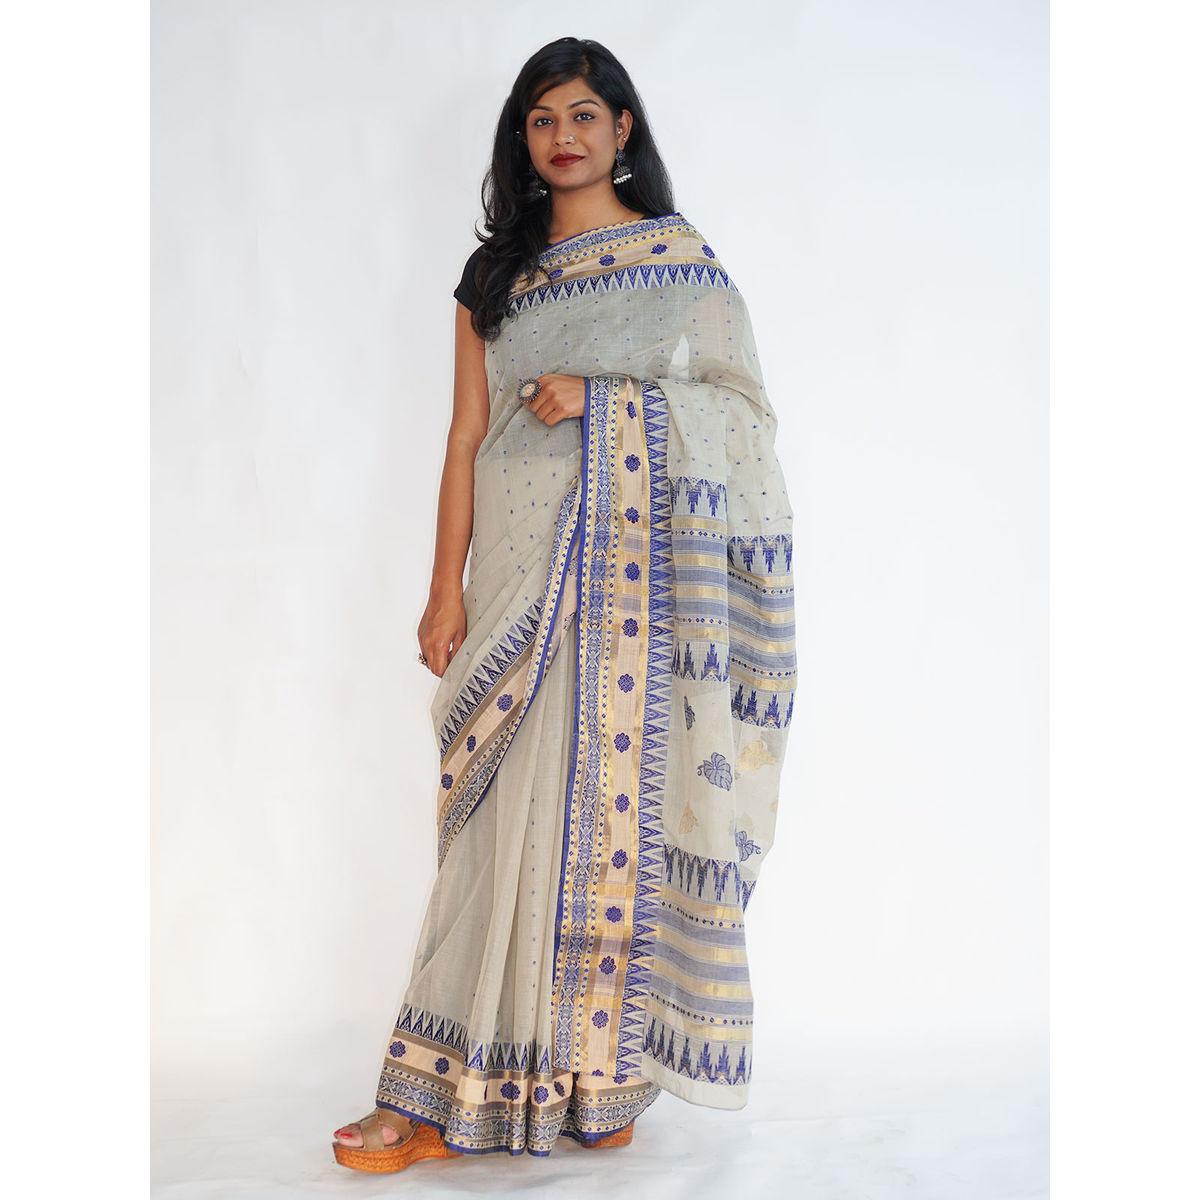 7bbabe1cd4528 Buy Light Green Handloom Cotton Saree Online - eIndianAugust